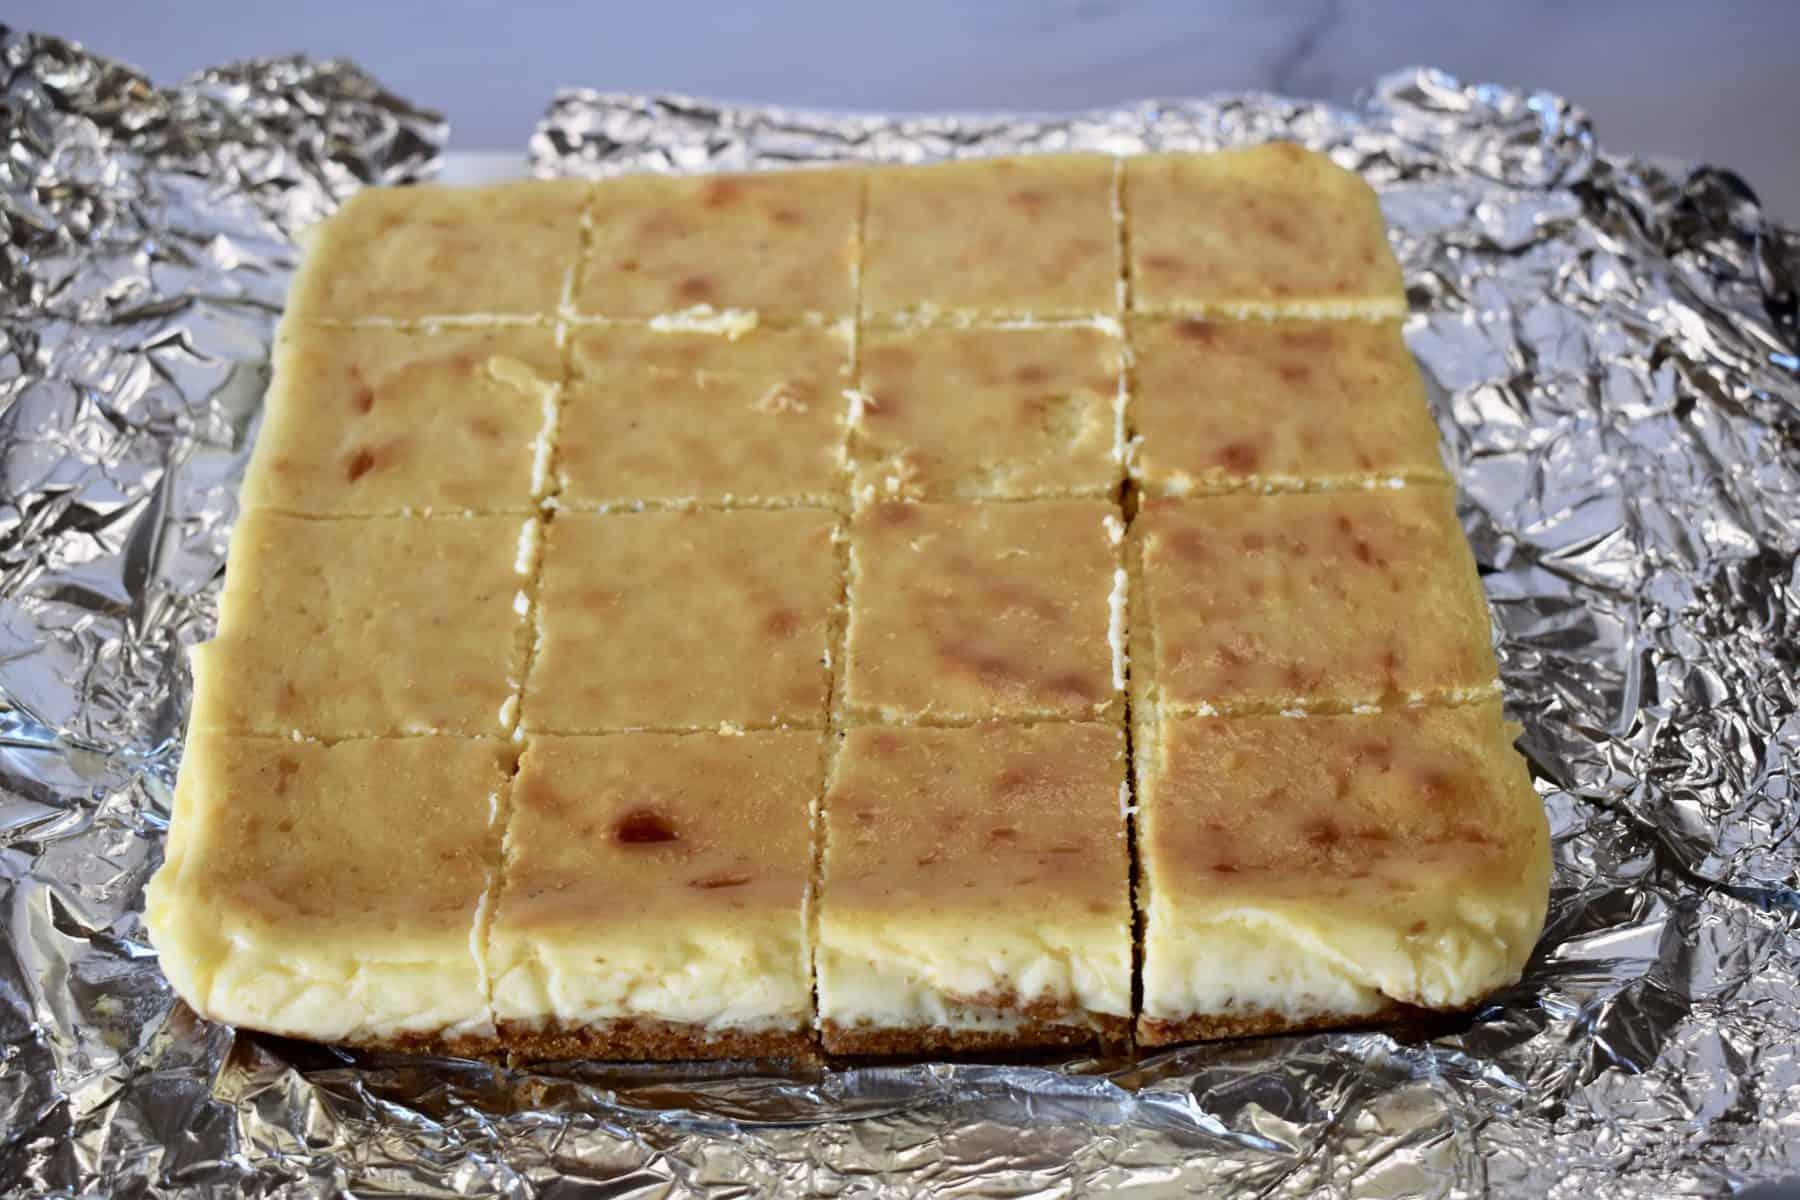 Sliced Eggnog Cheesecake Bars on foil.